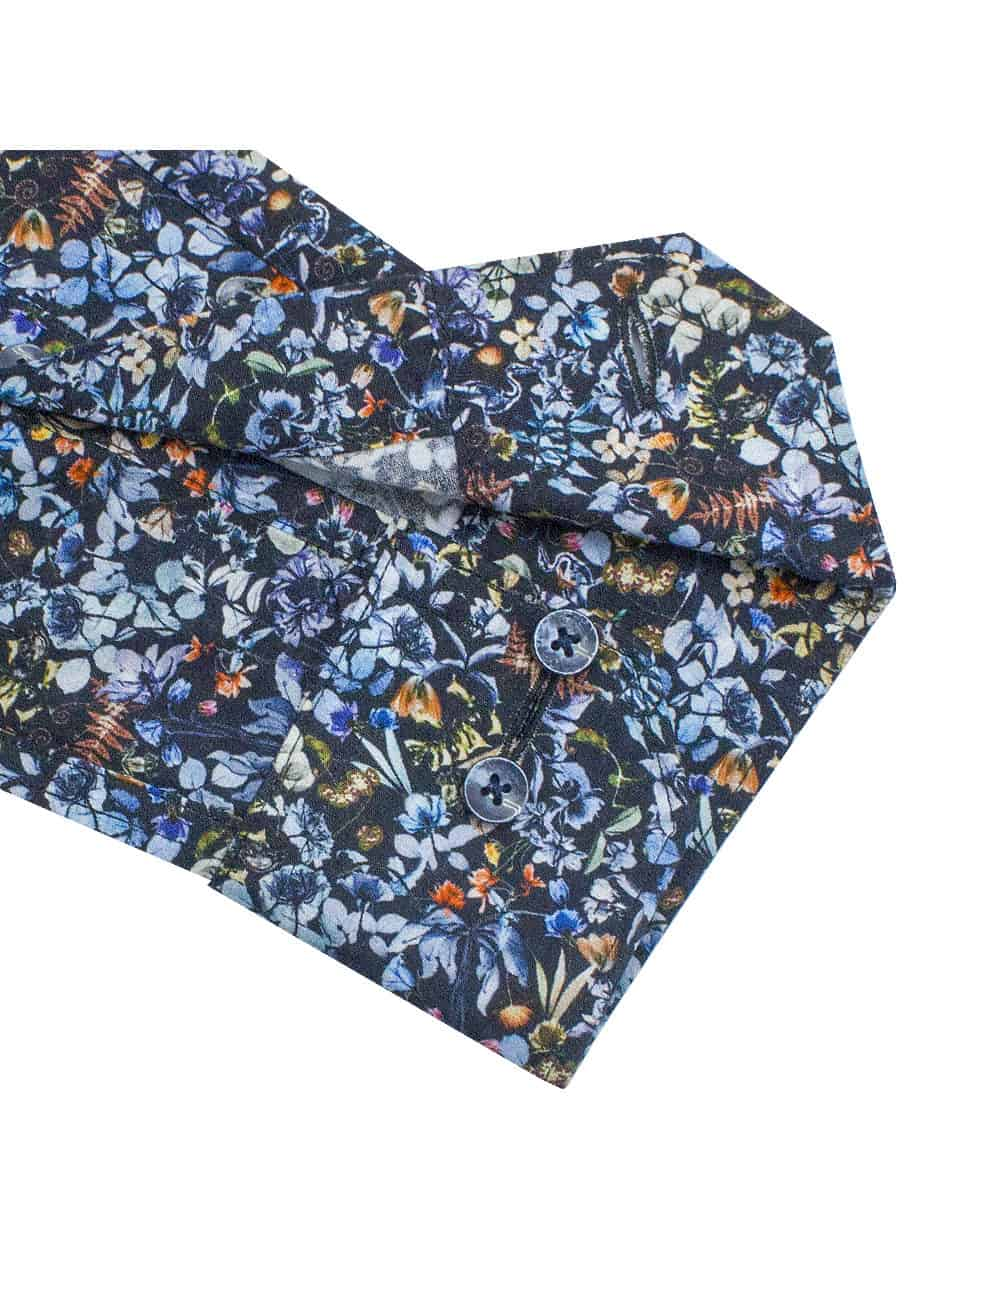 Tailored Fit 100% Premium Cotton Digitally Black Floral Print Italian Fabric Silky Finish Long Sleeve Single Cuff Shirt TF1A6.18